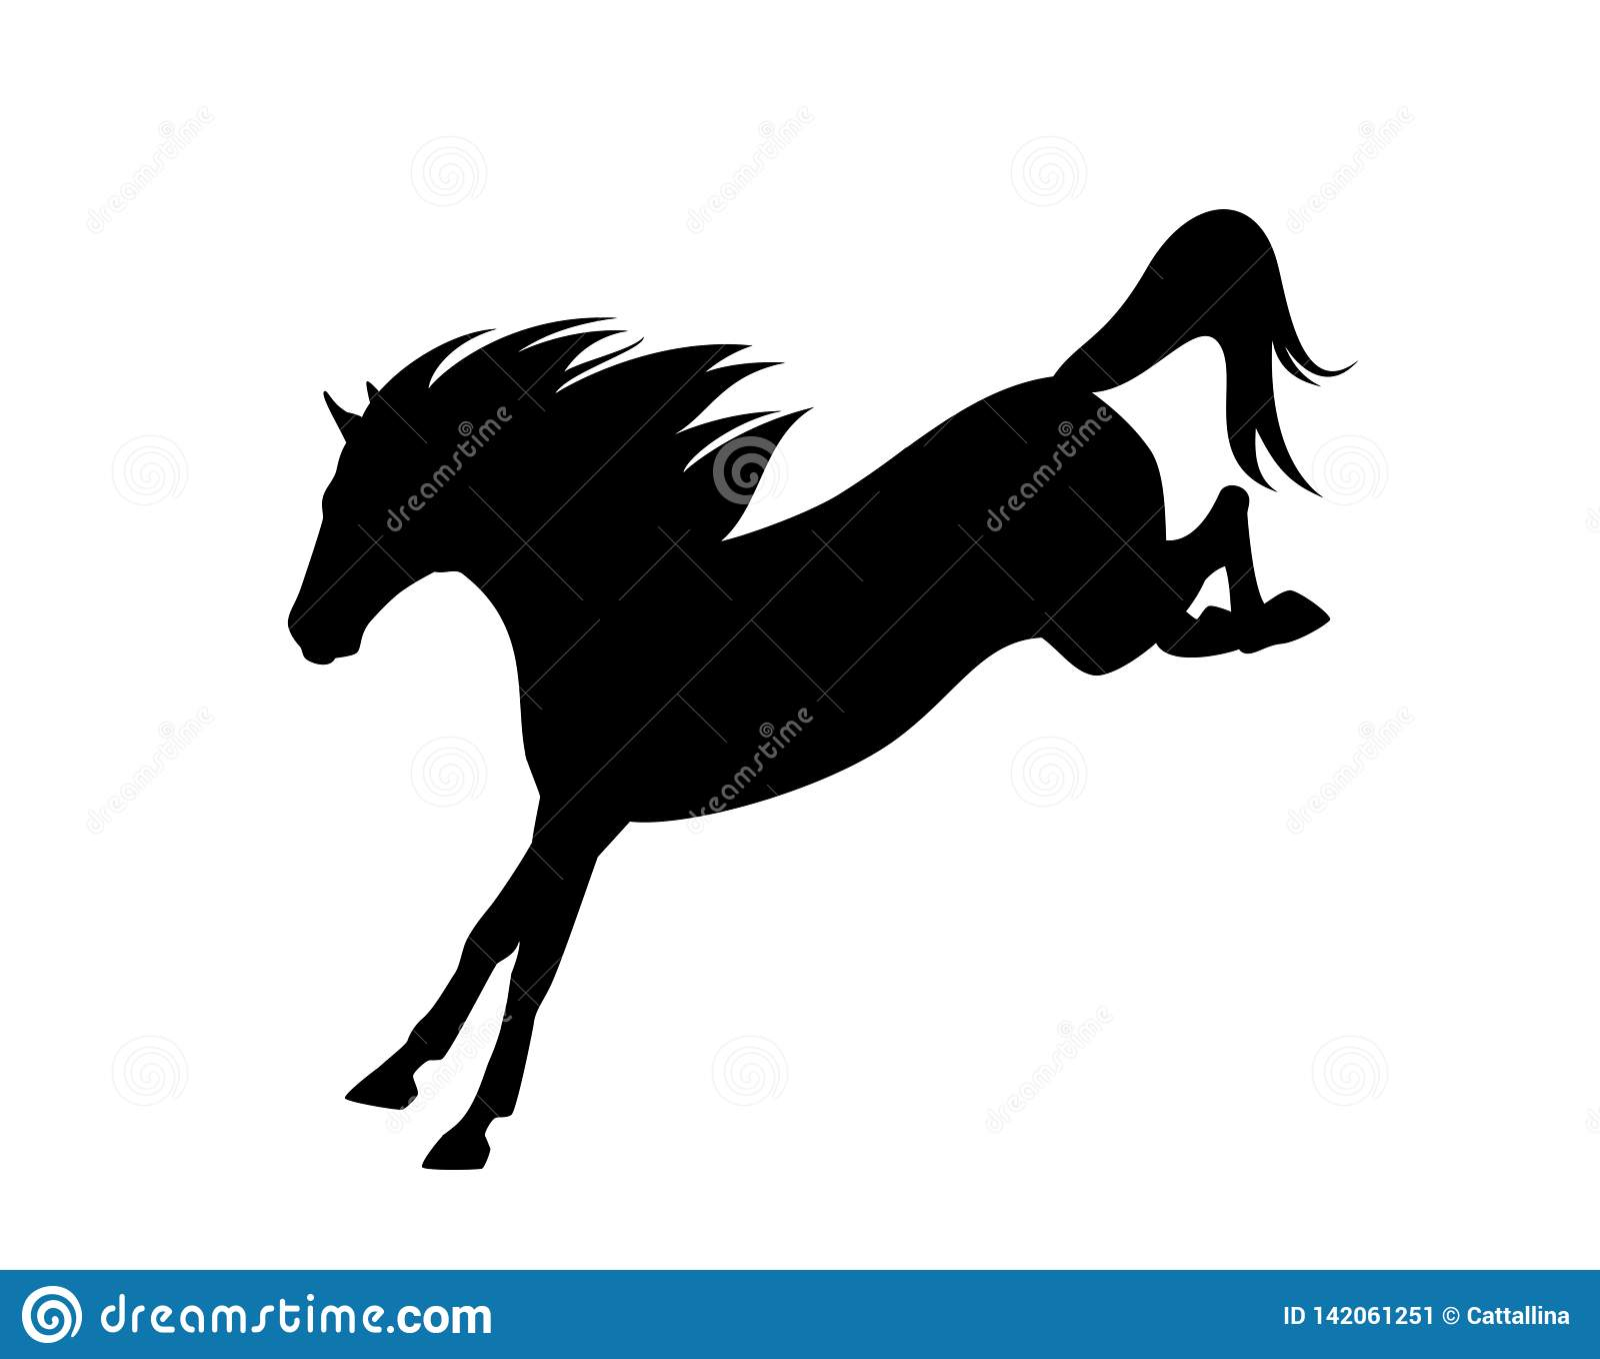 Black Horse Jumping Stock Illustrations 1 537 Black Horse Jumping Stock Illustrations Vectors Clipart Dreamstime